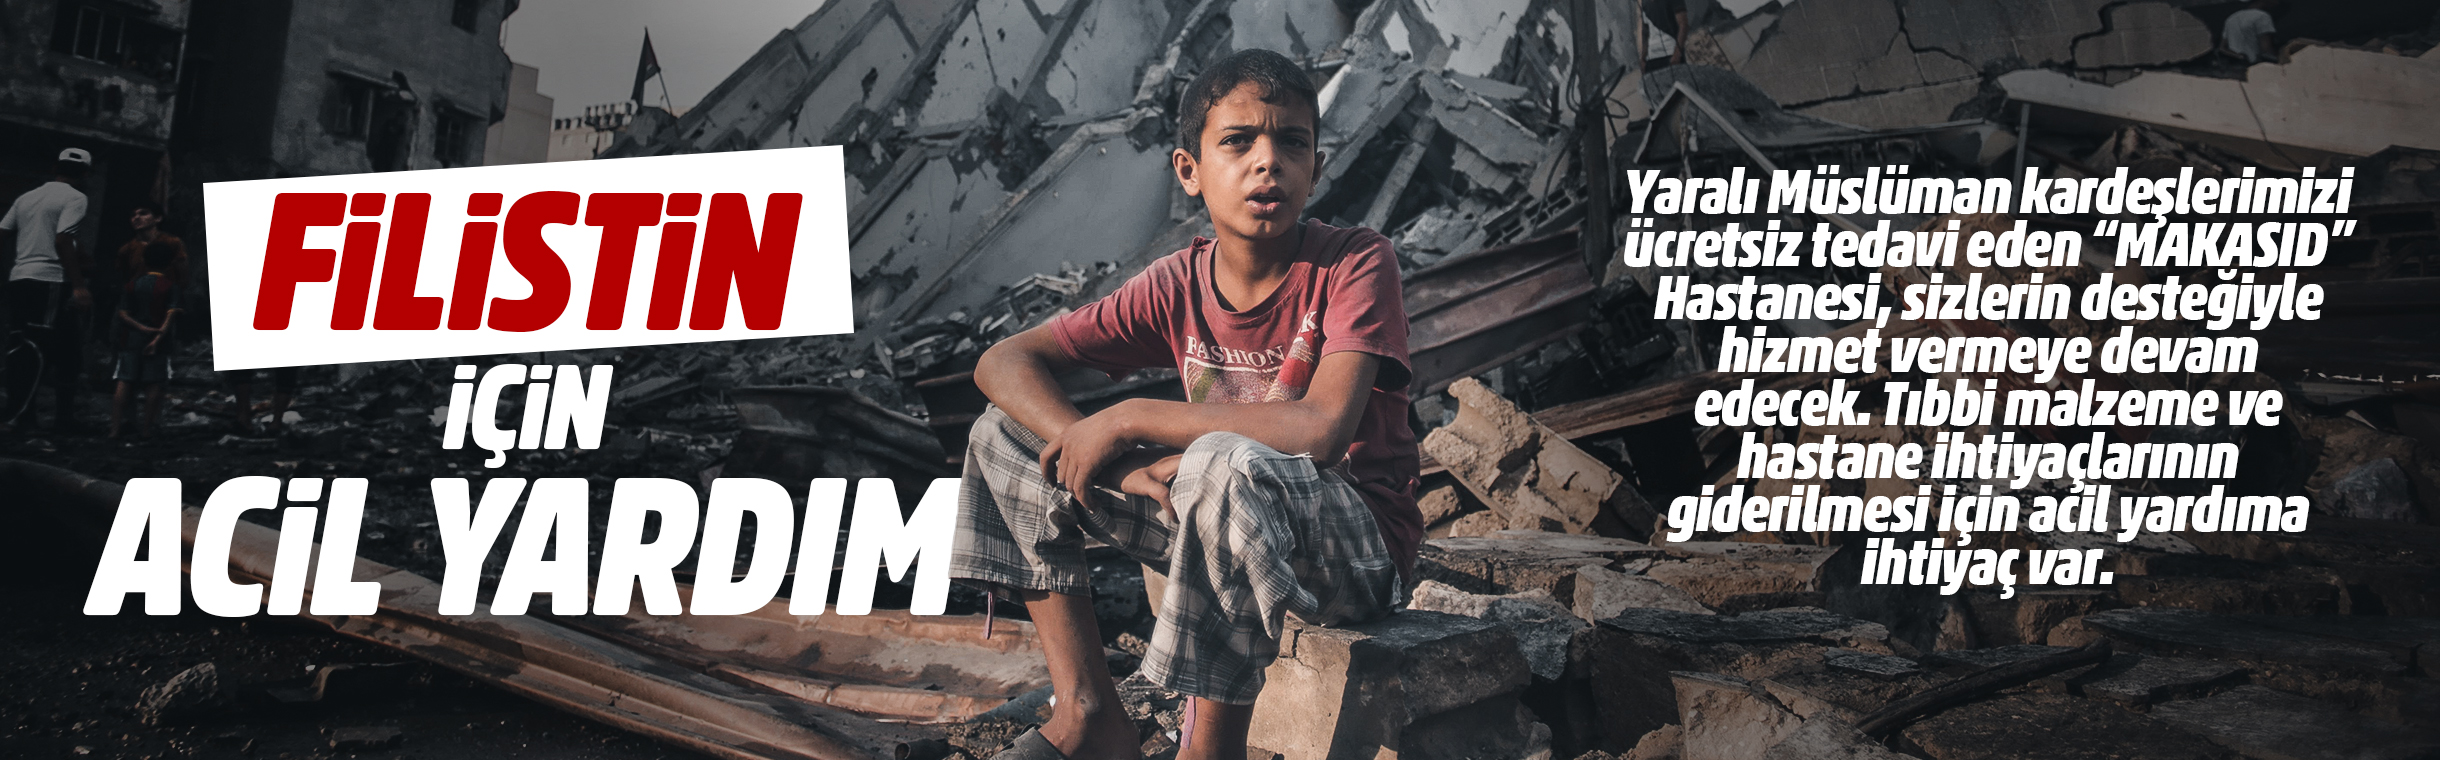 Filistin Acil Yardım